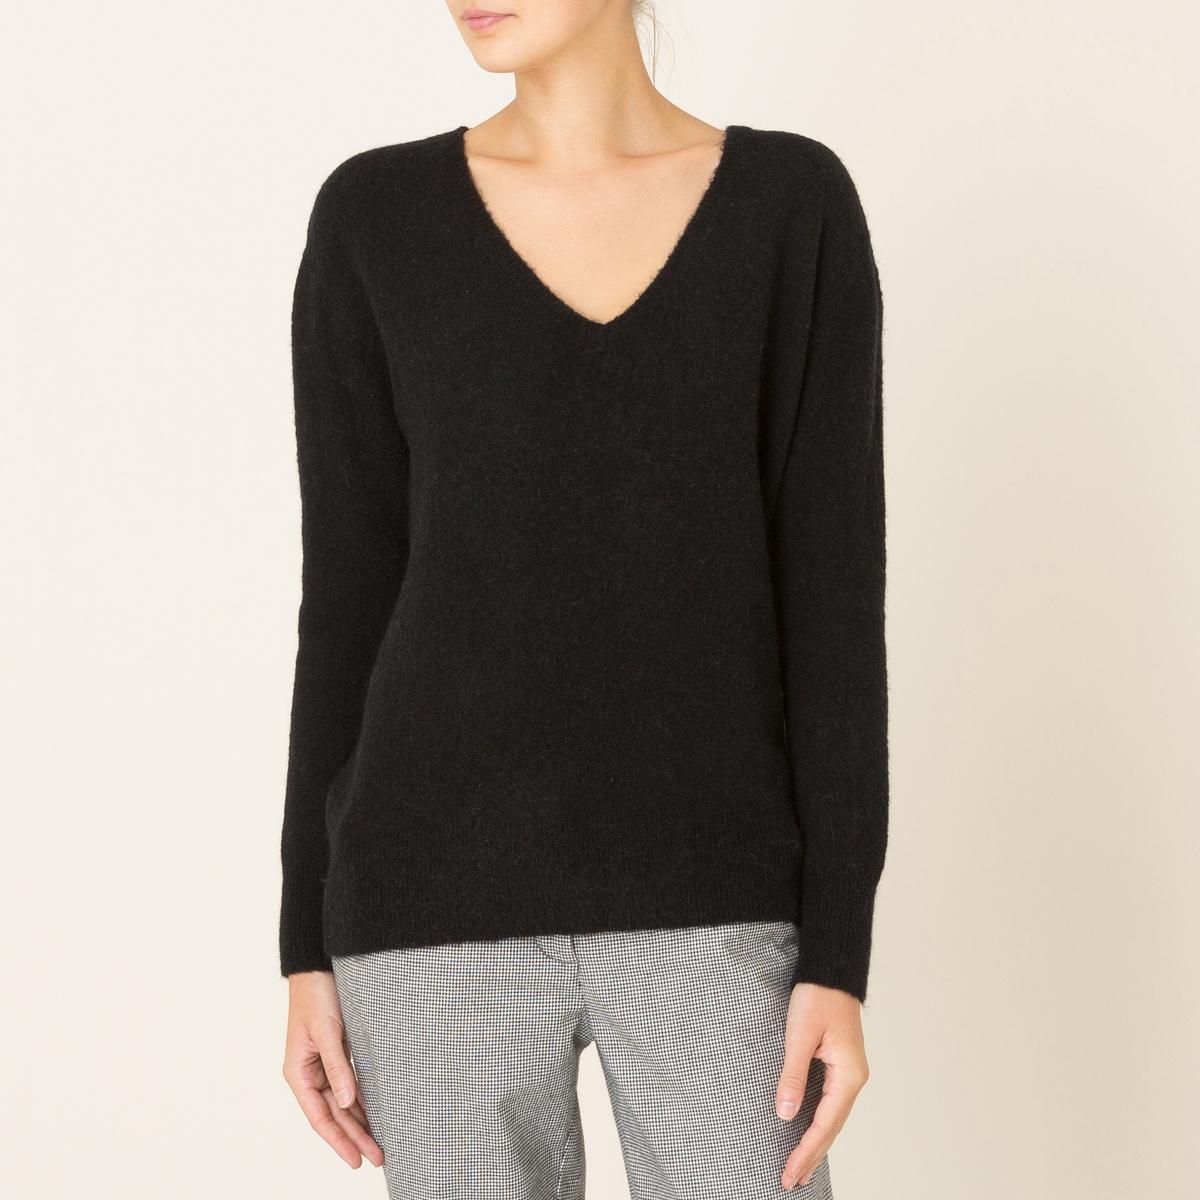 Пуловер TERIYAKIСостав и описание Материал : 42% шерсти, 42% полиамида, 14% альпаки, 2% эластана.Марка : HARRIS WILSON<br><br>Цвет: серый,черный